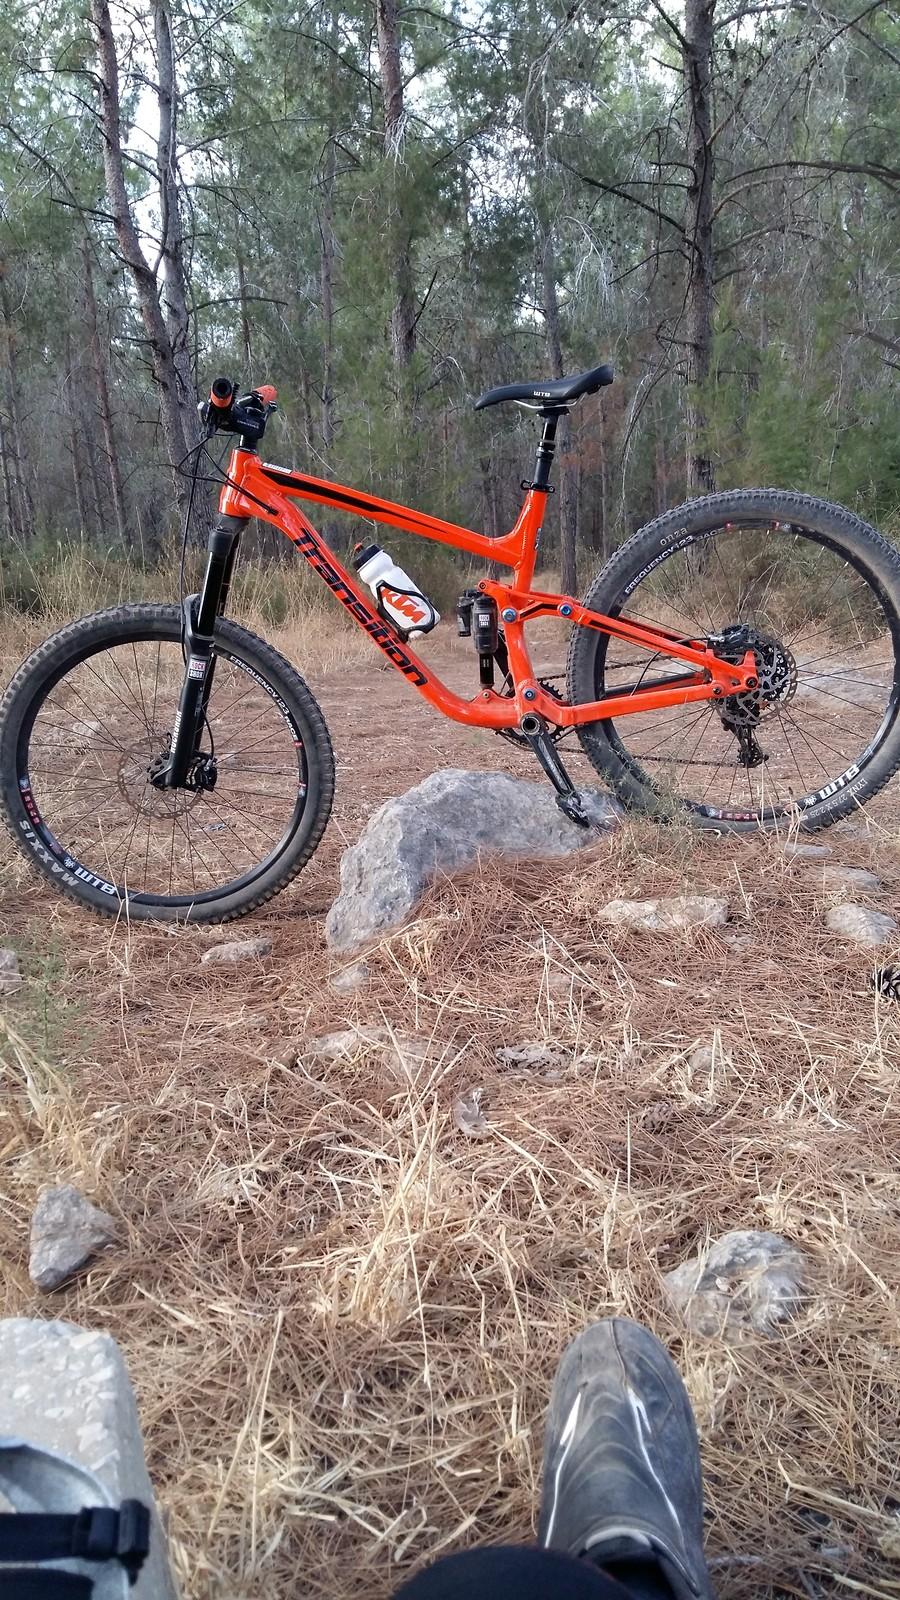 20150630 071025 - yaron dot - Mountain Biking Pictures - Vital MTB